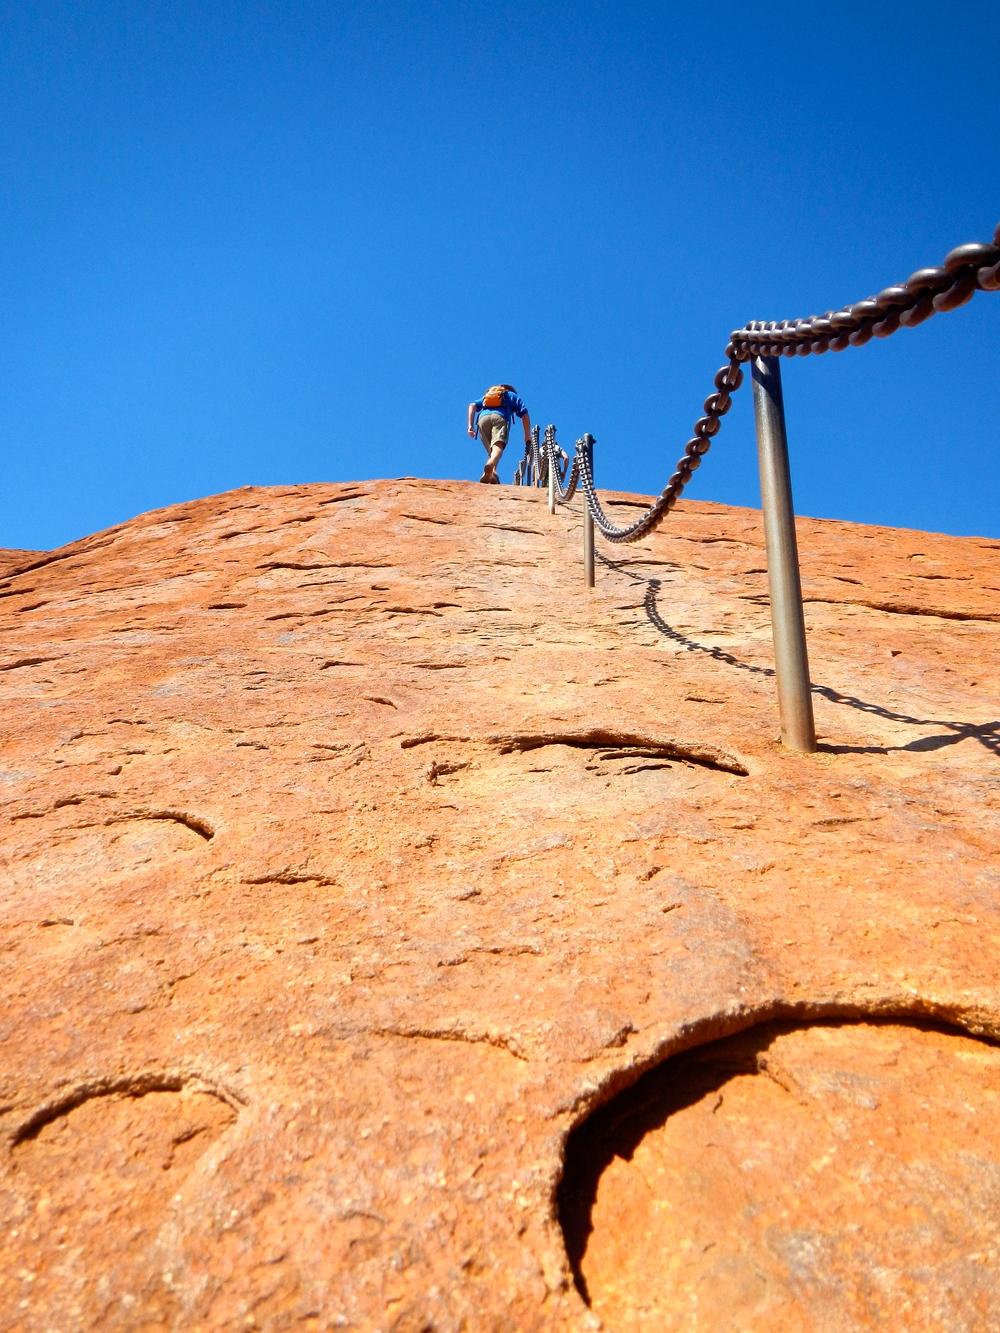 The Rock Climb